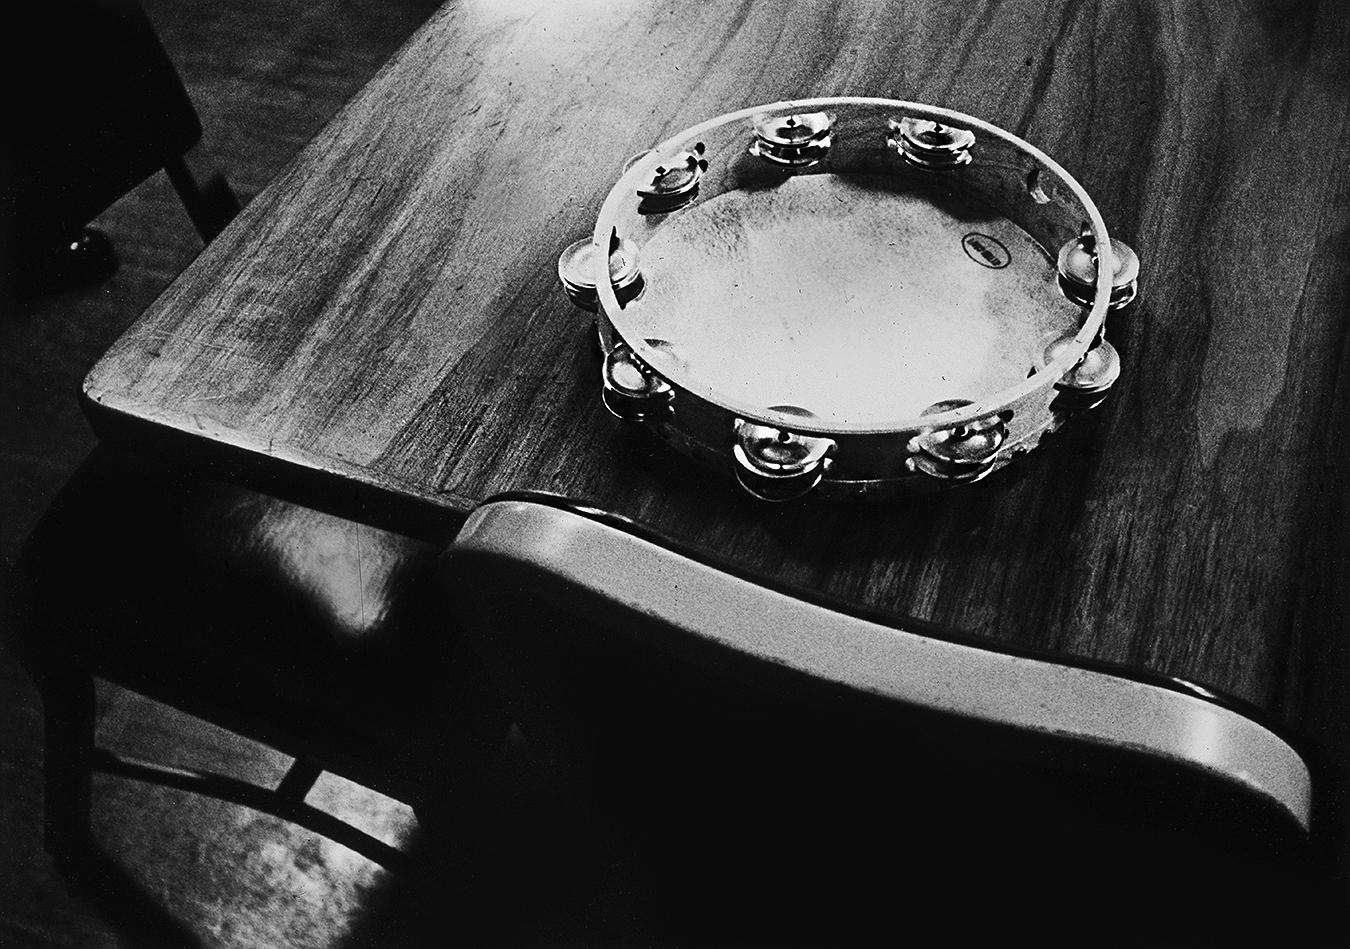 Tony_Ward_photography_early_work_house_of_prayer_music_tambourine_music